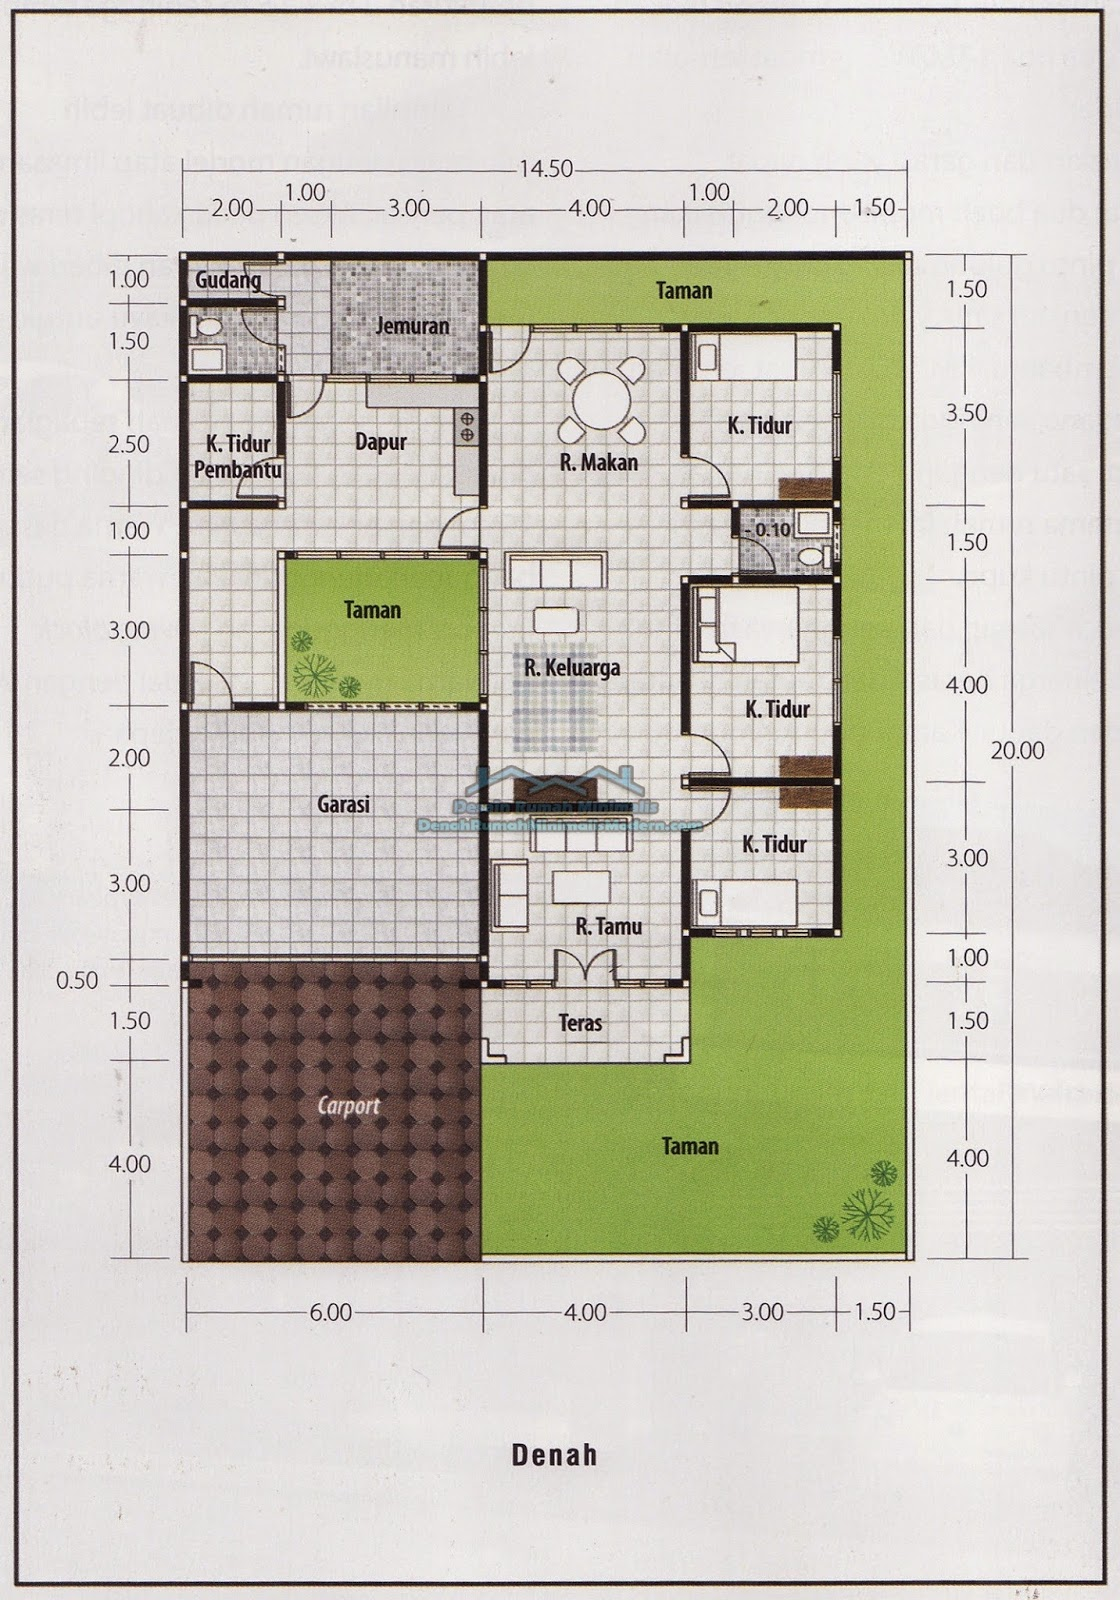 Desain Rumah Minimalis 1 Lantai Luas Tanah 200m2 Content